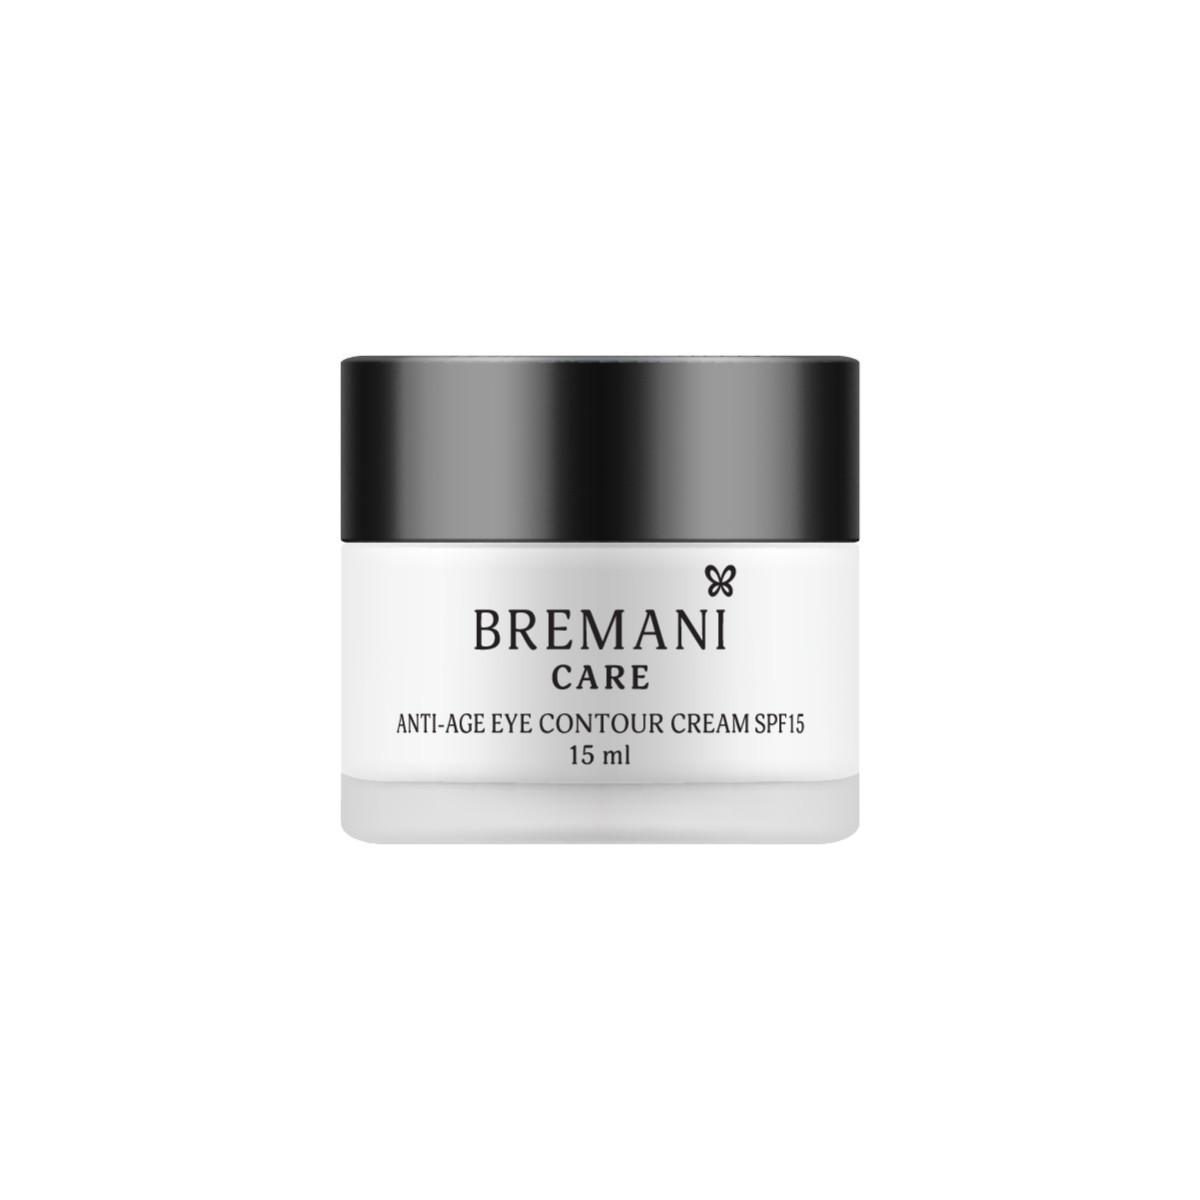 Anti-age Eye Contour Cream SPF15 Антивозрастной крем для кожи вокруг глаз SPF15 40+,    Bremani, 15ml